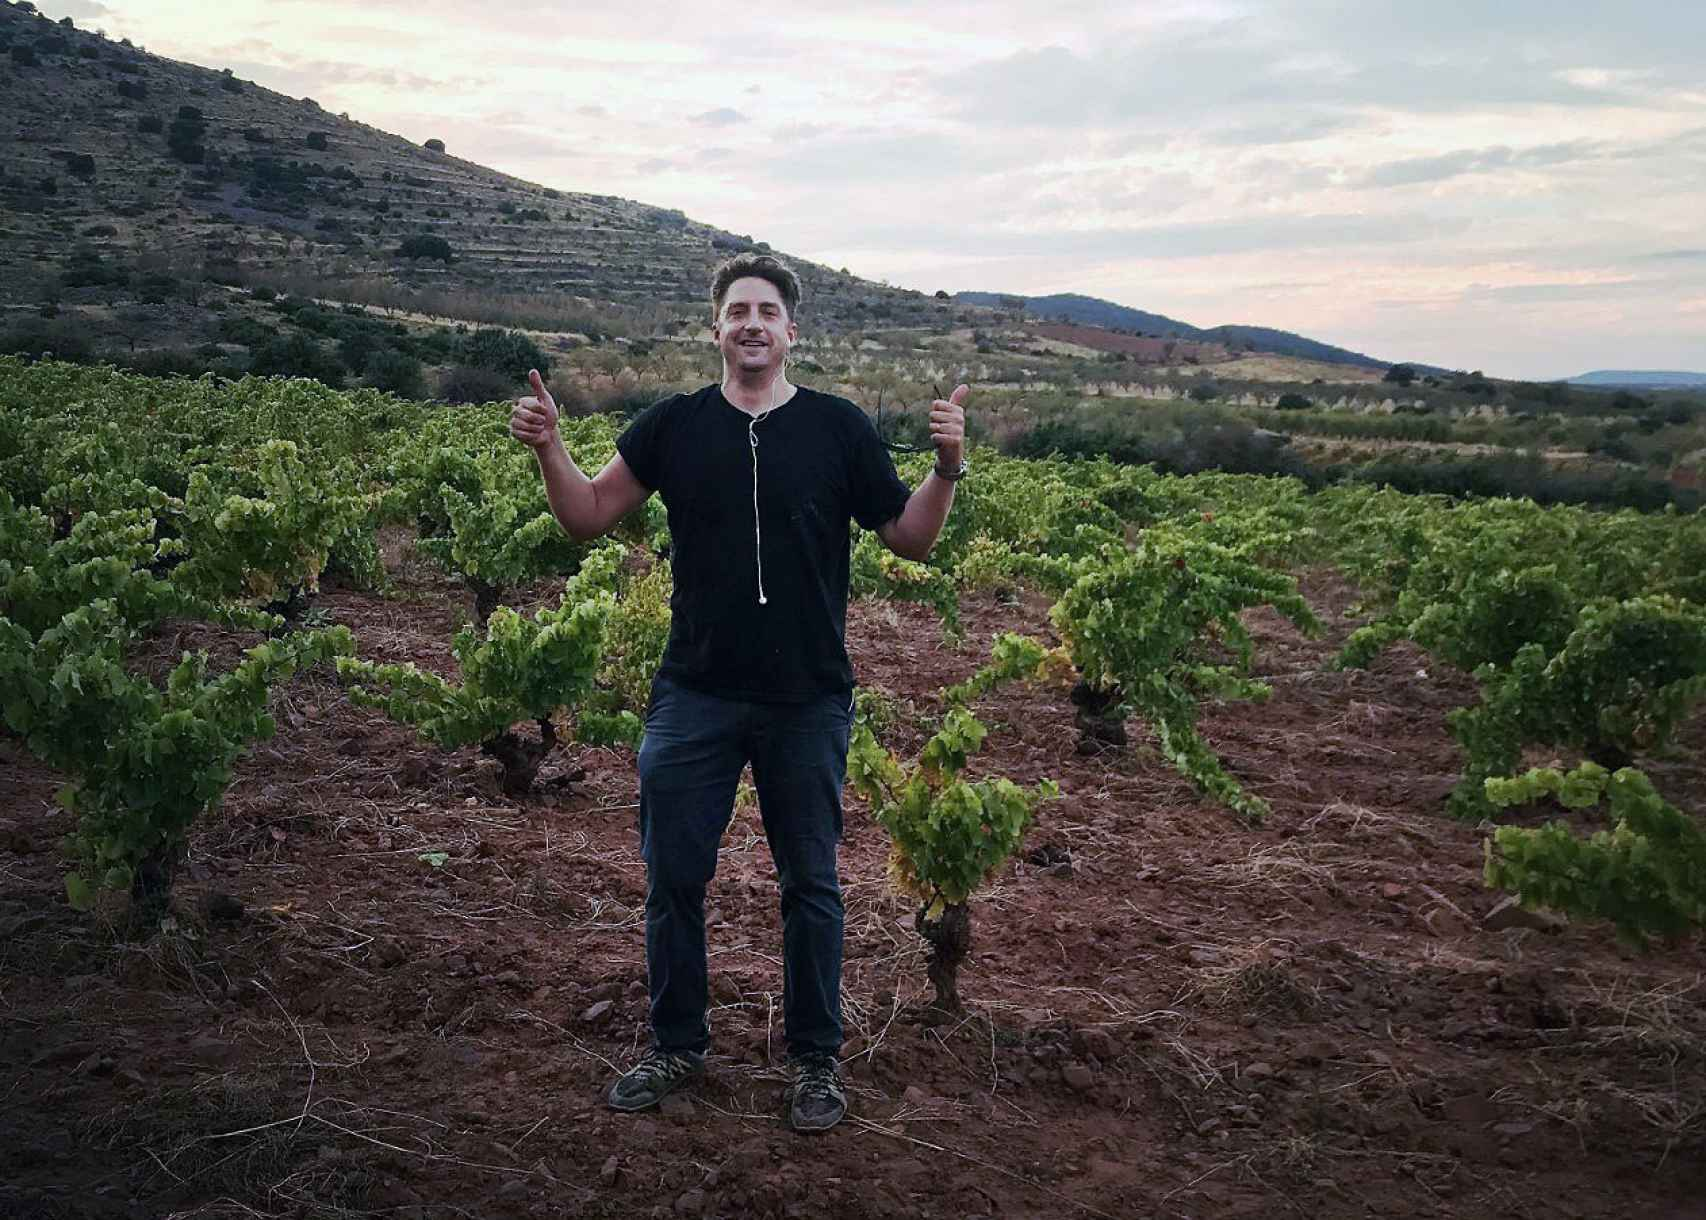 Michael Cooper, 'winegrower' de Vinos del Viento.